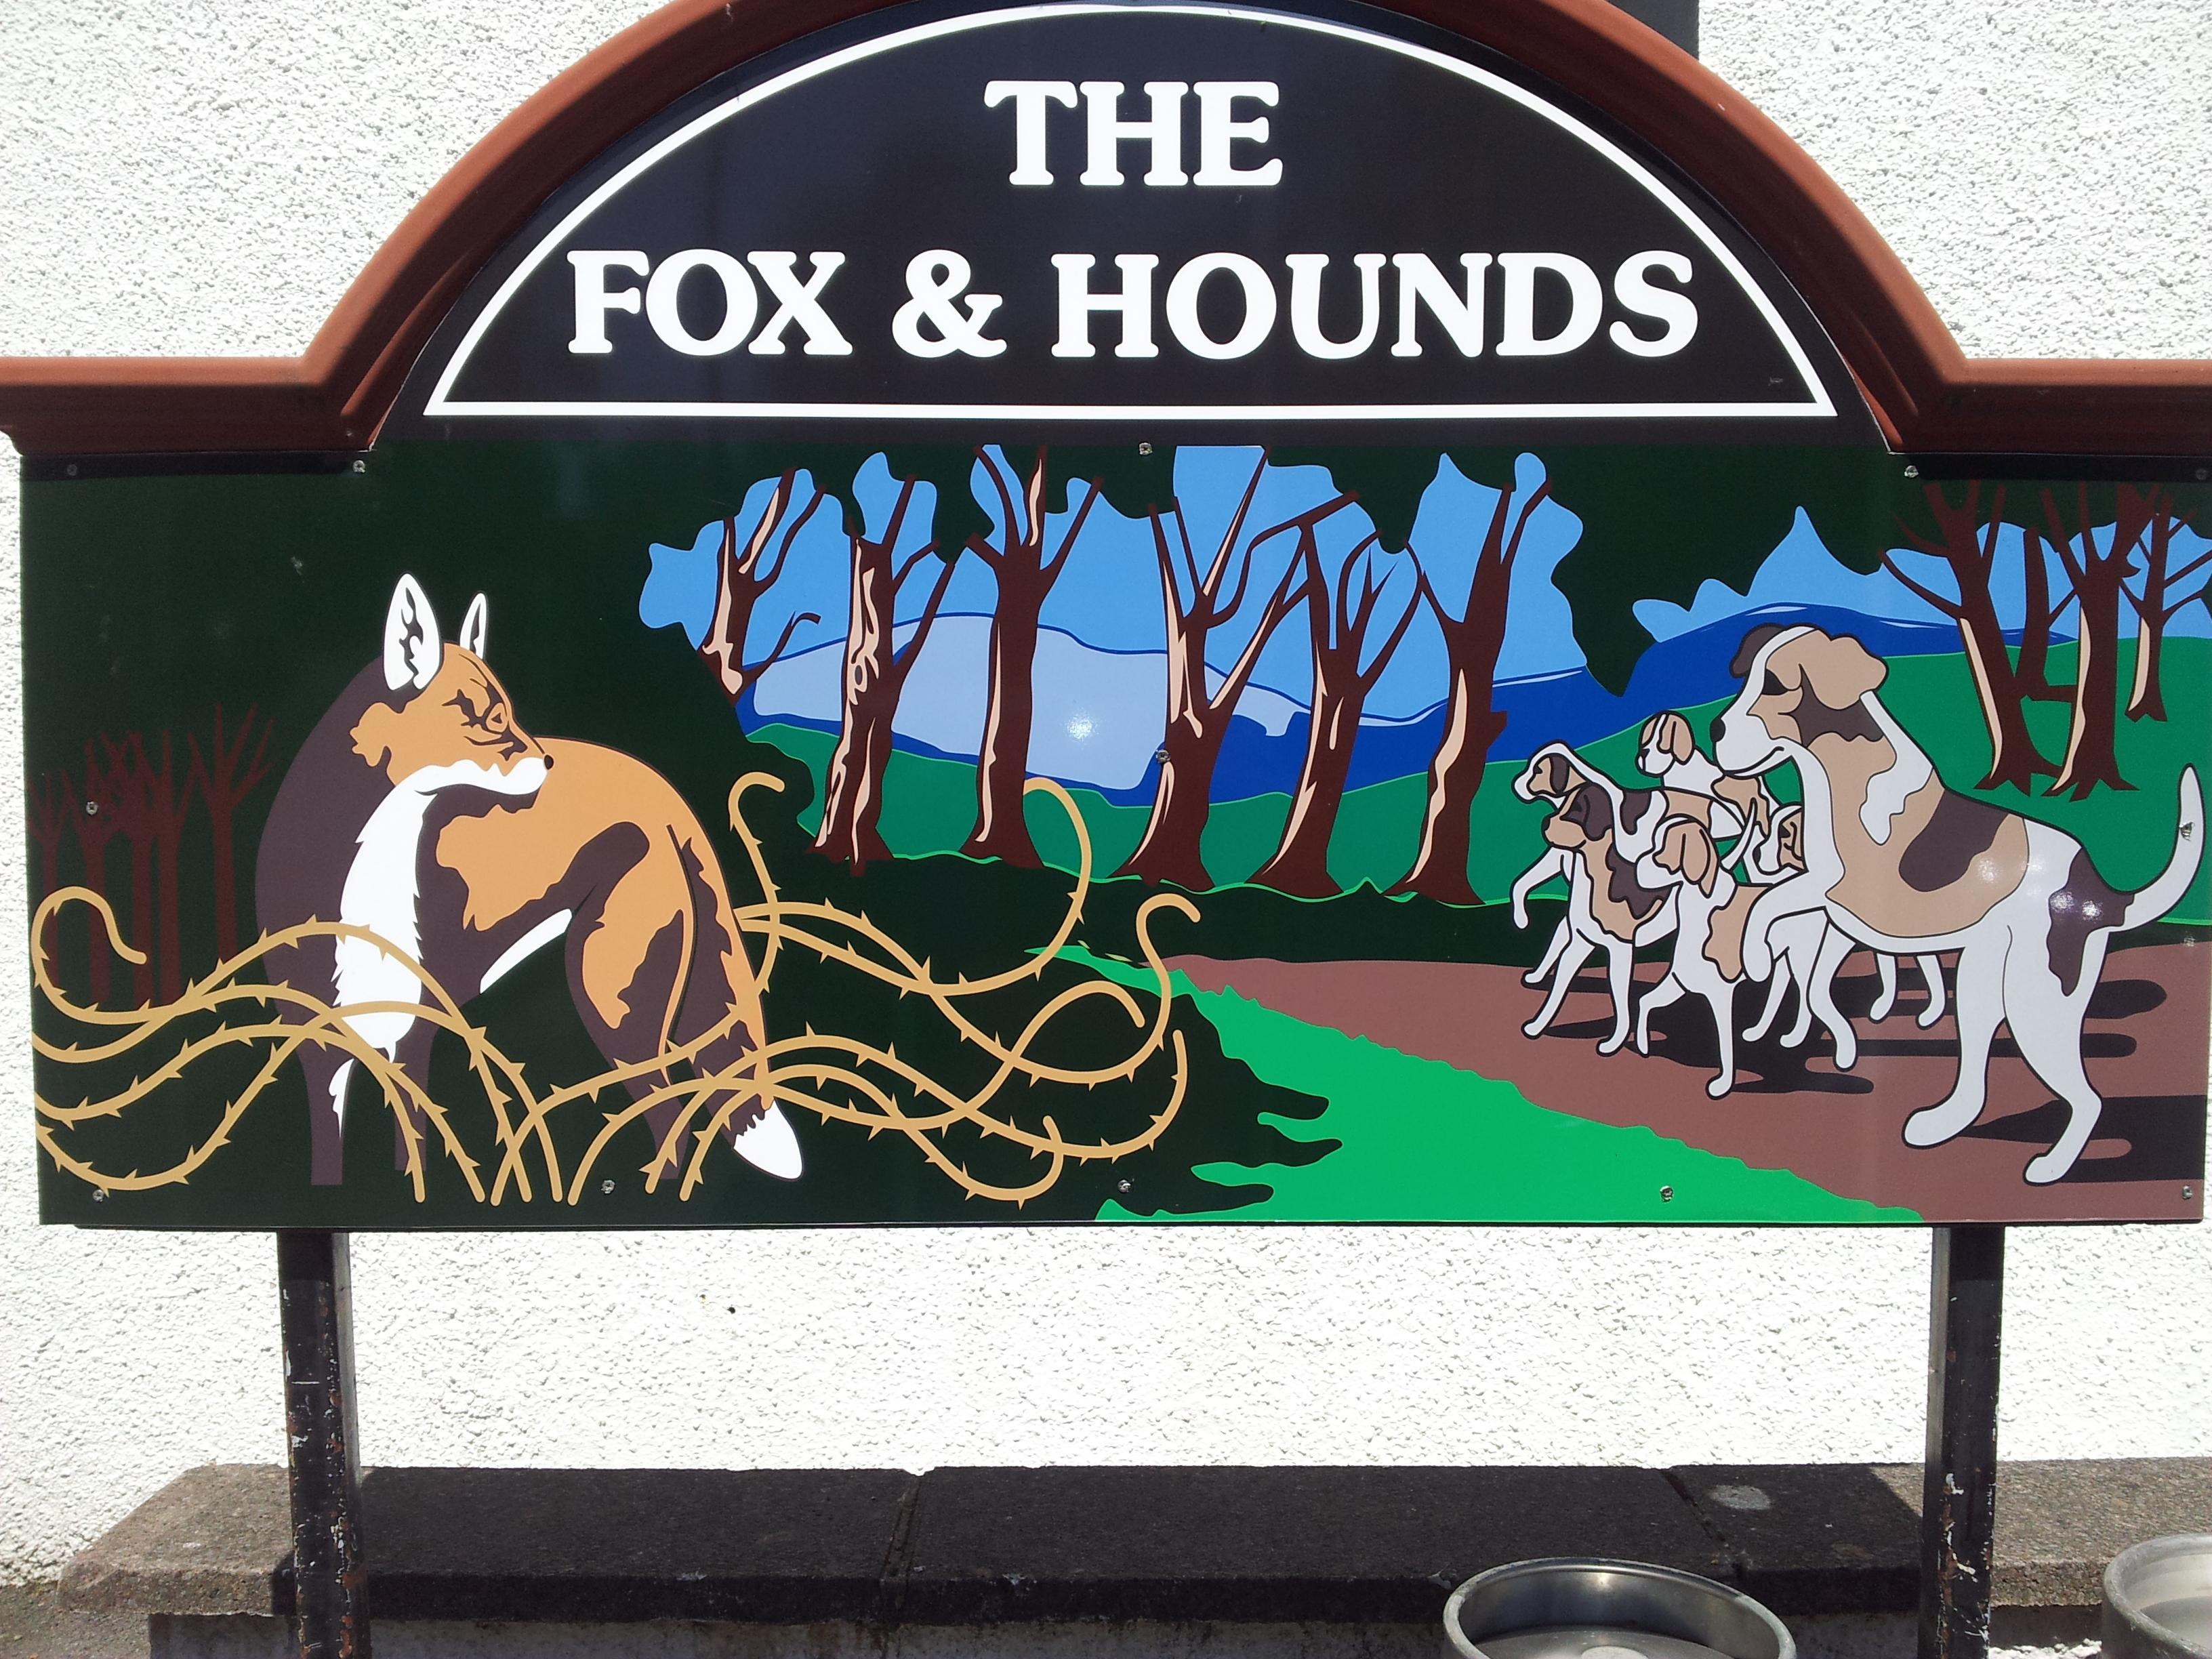 Fox and Hounds - an Ennerdale Hub community run pub